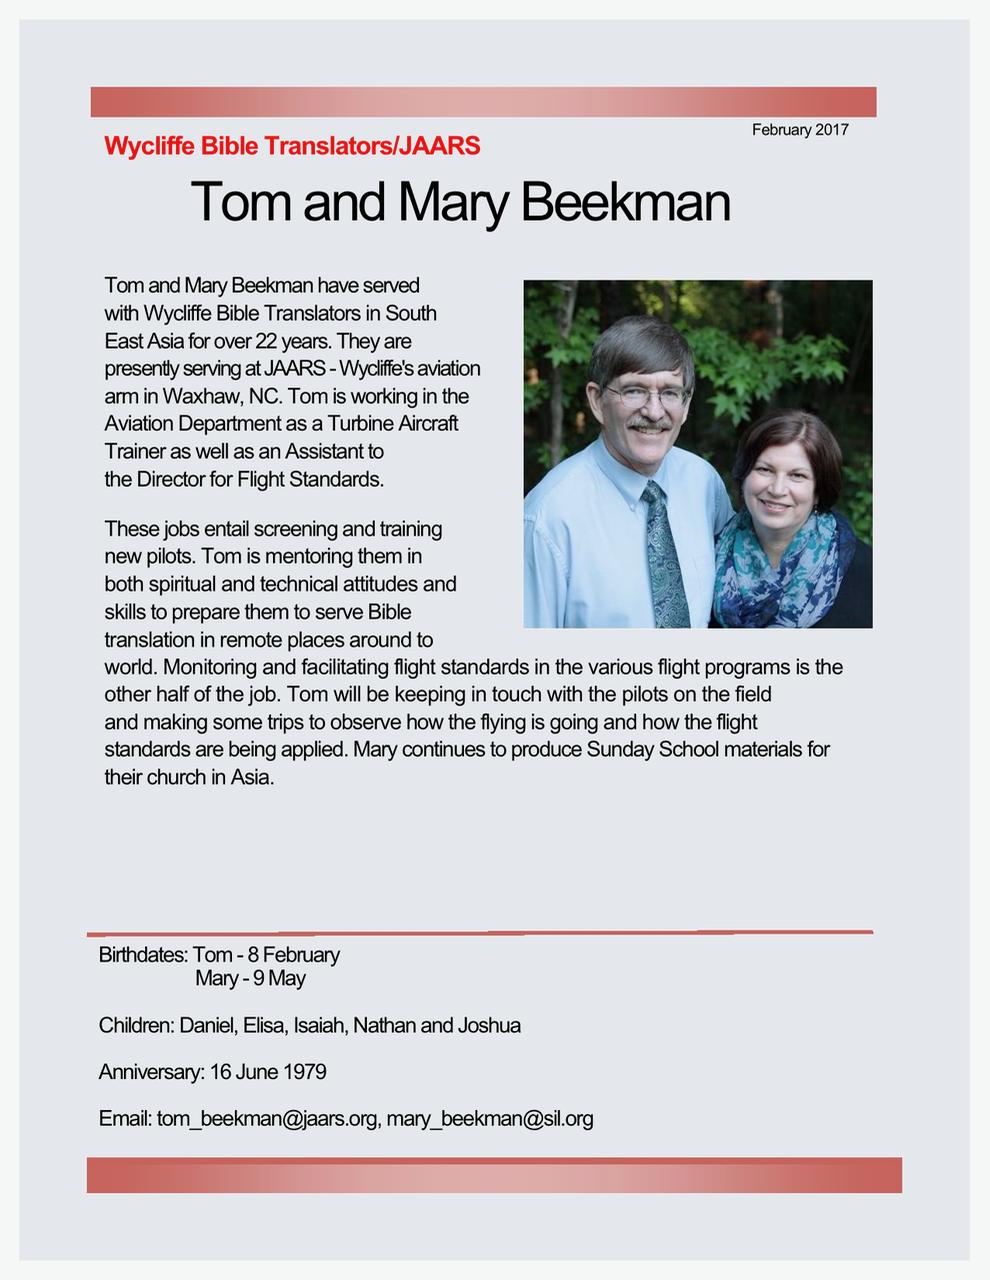 Tom and Mary Beekman